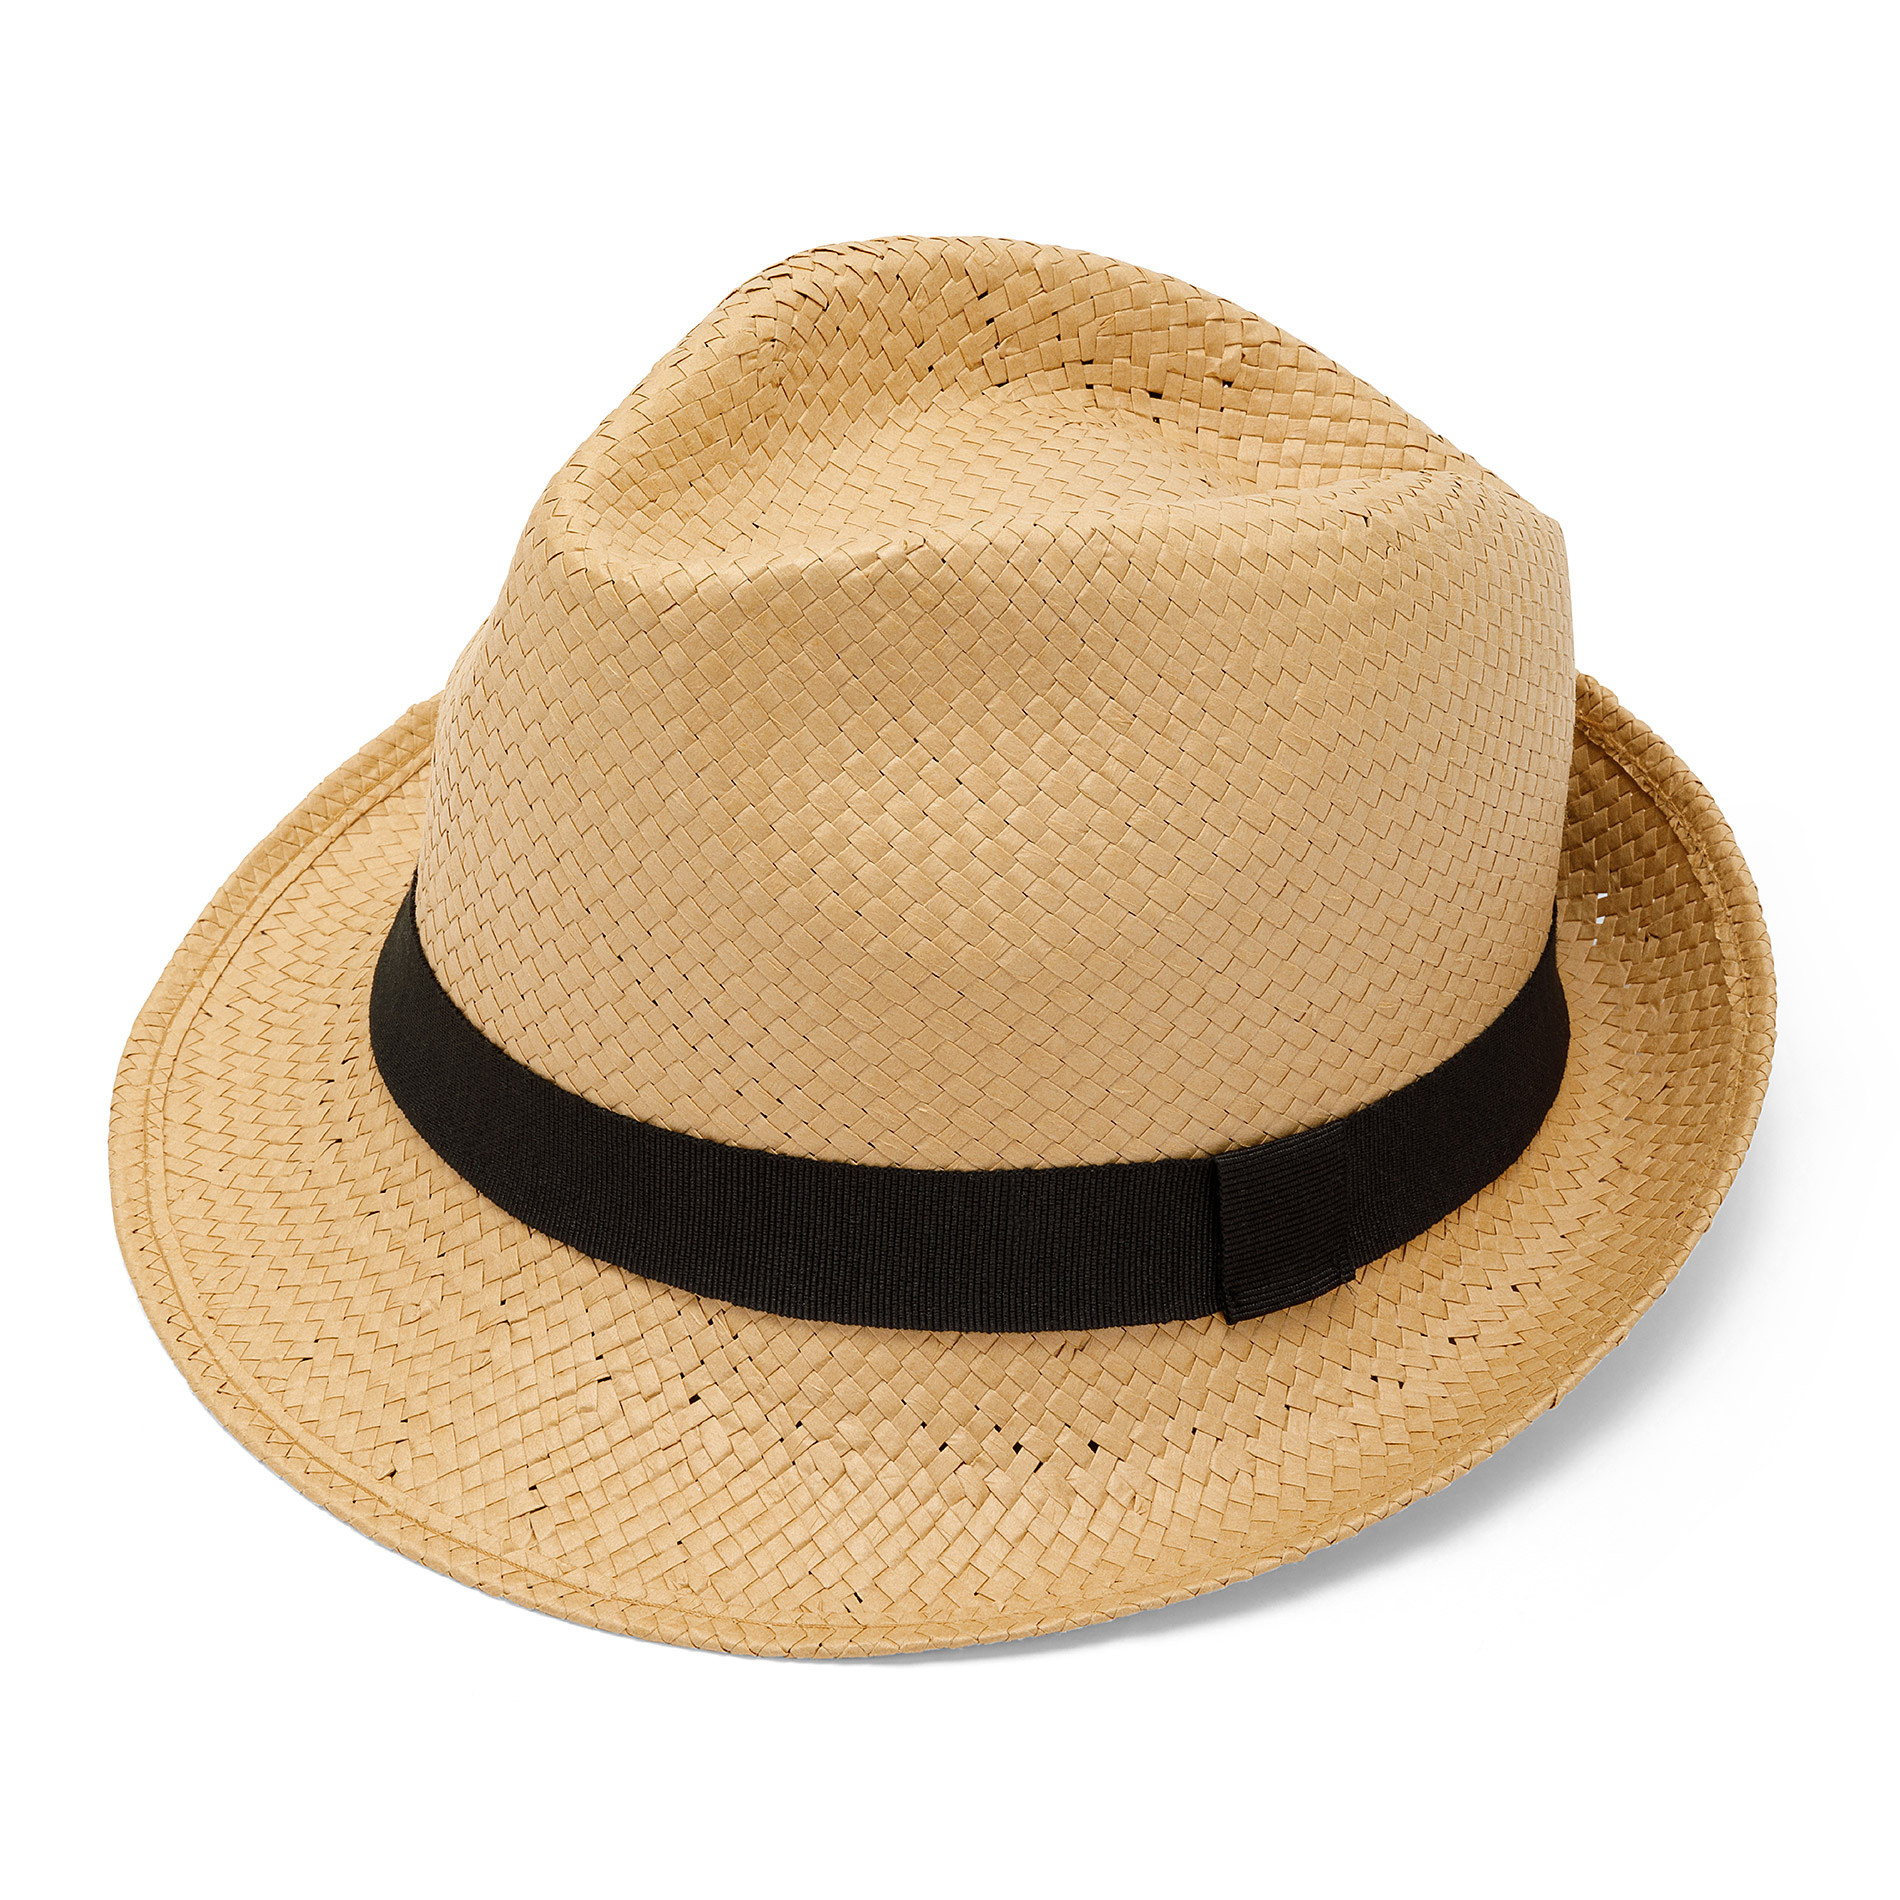 Cappello paglia intrecciata Luca D'Altieri, Beige, large image number 0